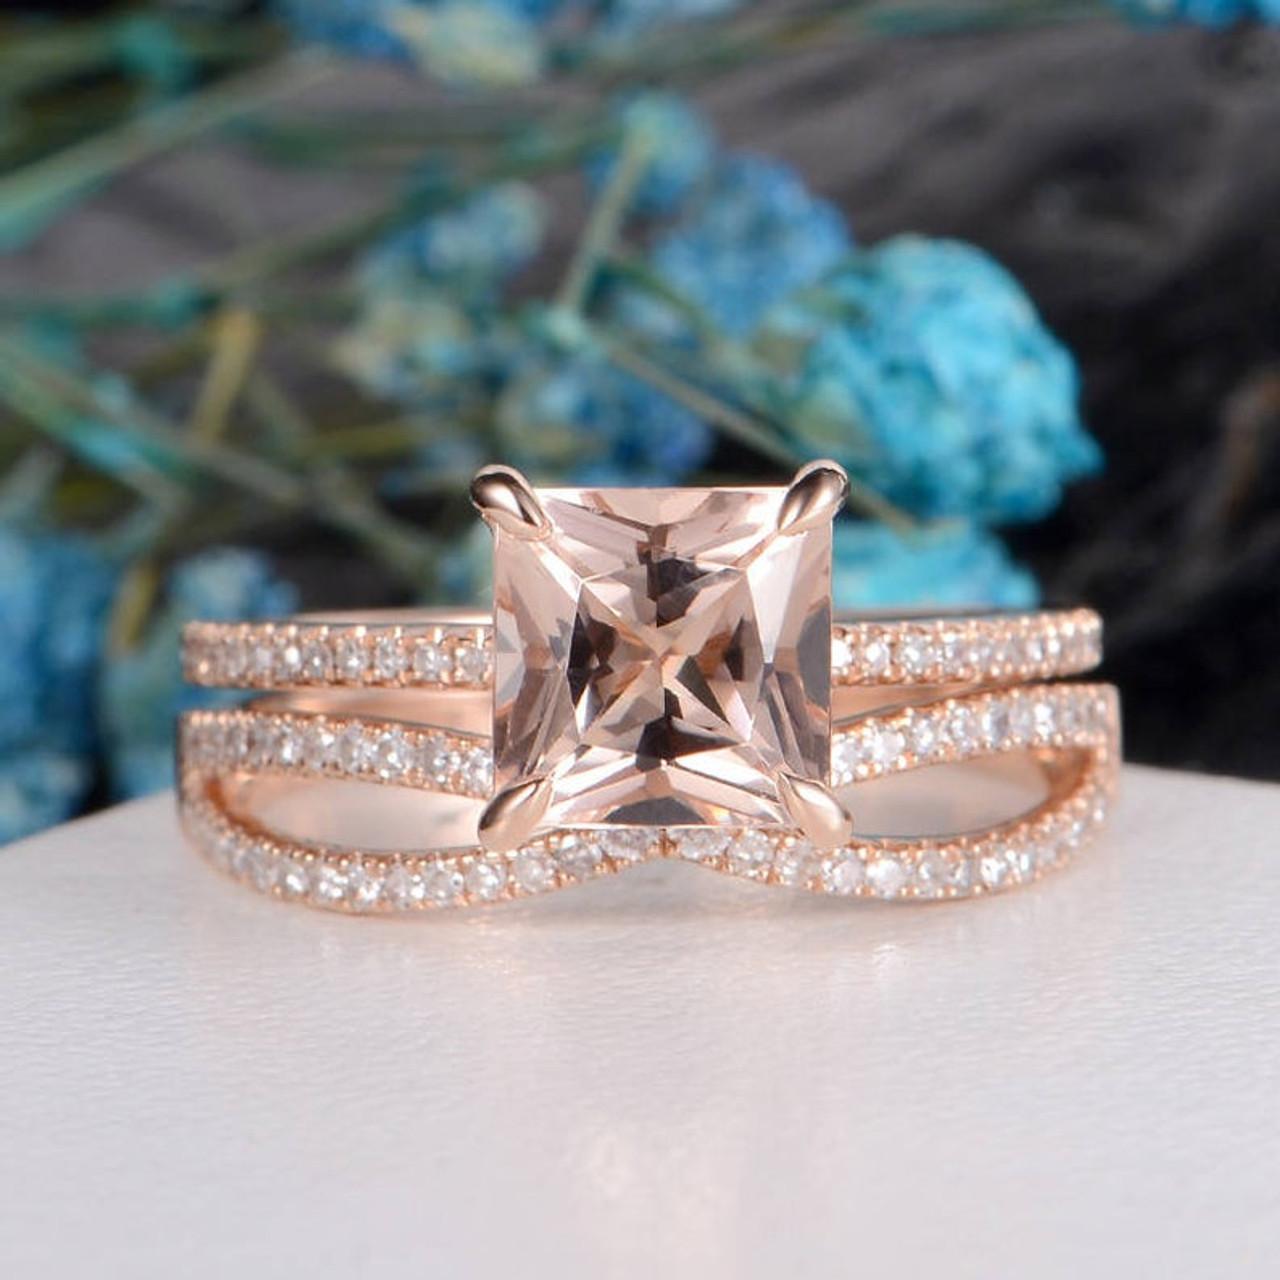 Princess Cut Morganite Engagement Ring Art Deco Morganite Ring Rose Gold Antique Wedding Band Women Diamond Eternity Promise Stacking 3pcs